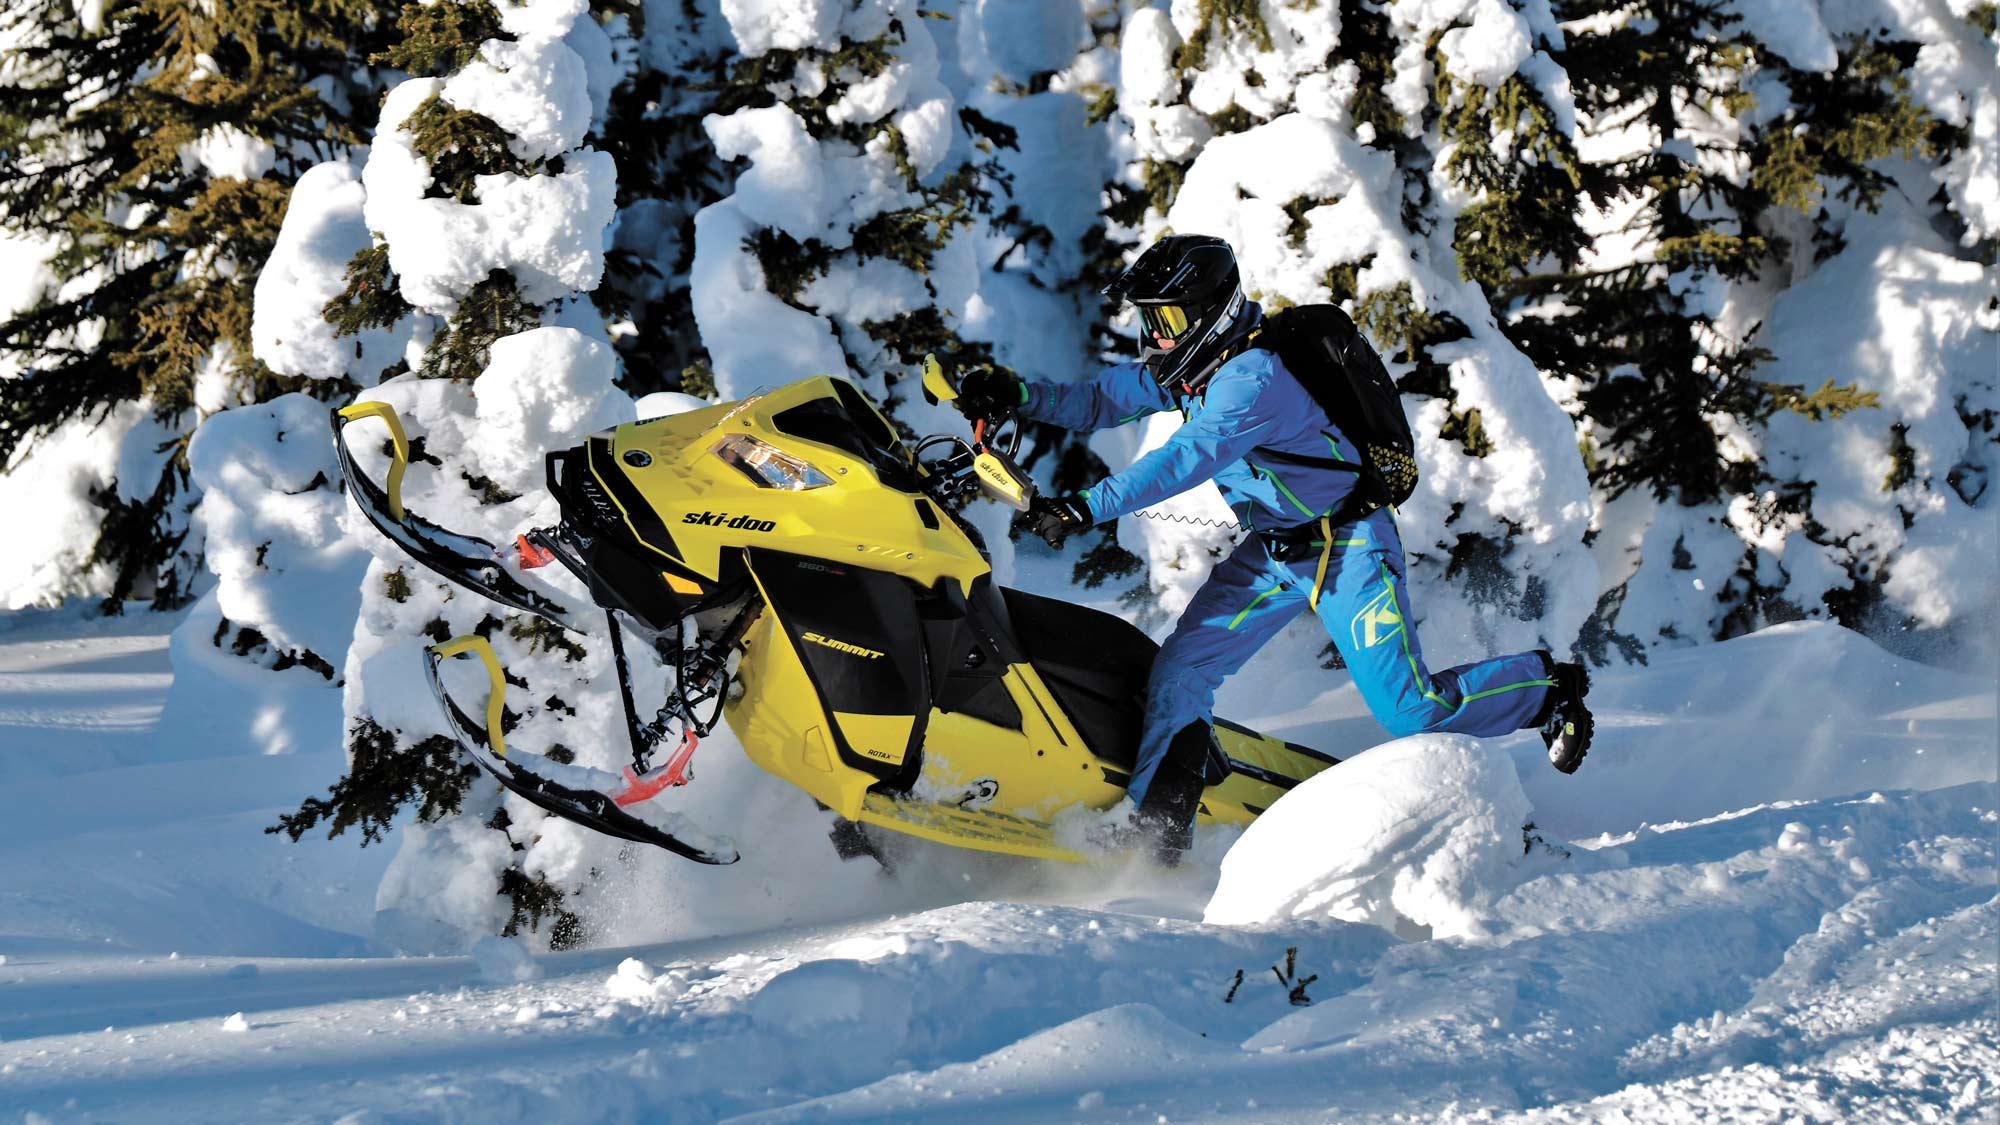 Ski-doo: encore des innovations en 2021